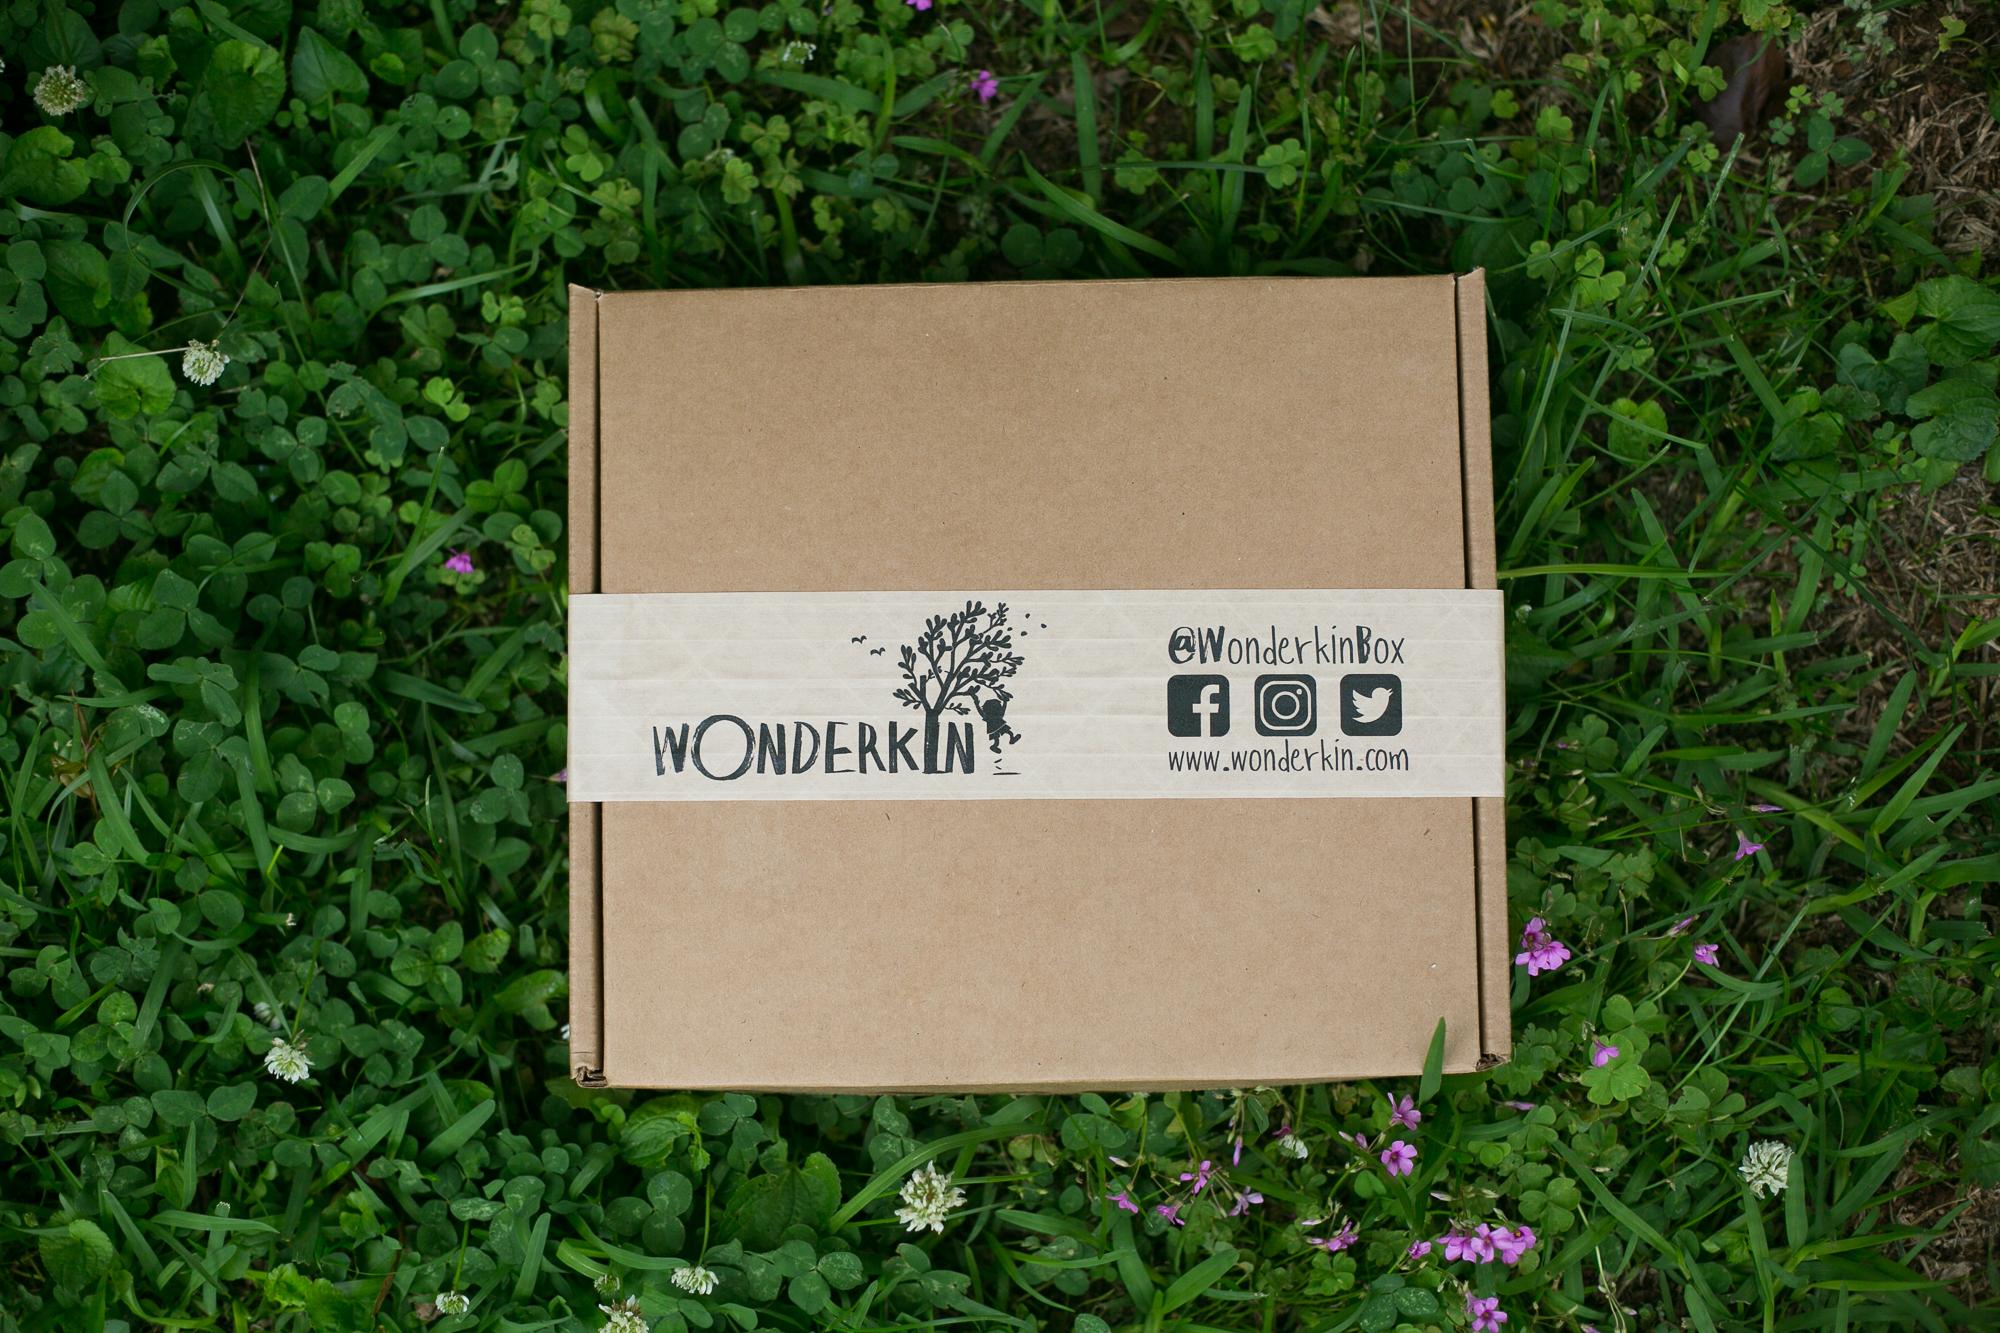 Wonderkin Subscription Box